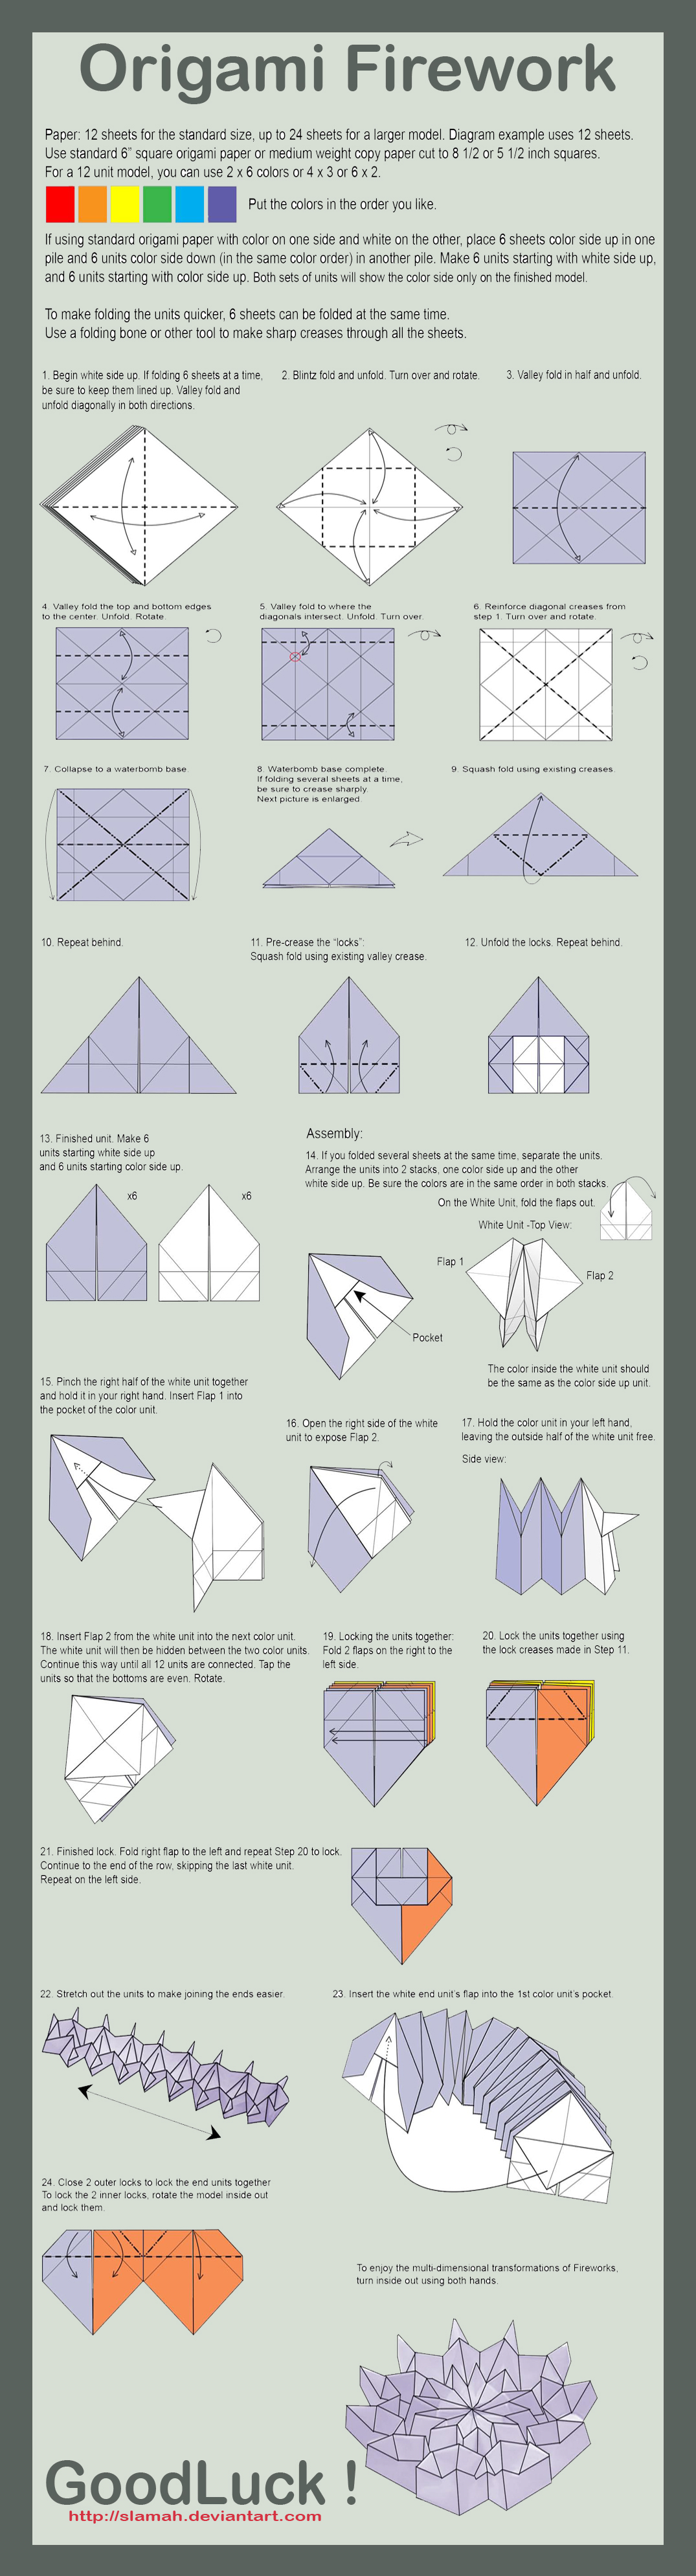 origami firework folding instructions | origami ... easy diagram of firework